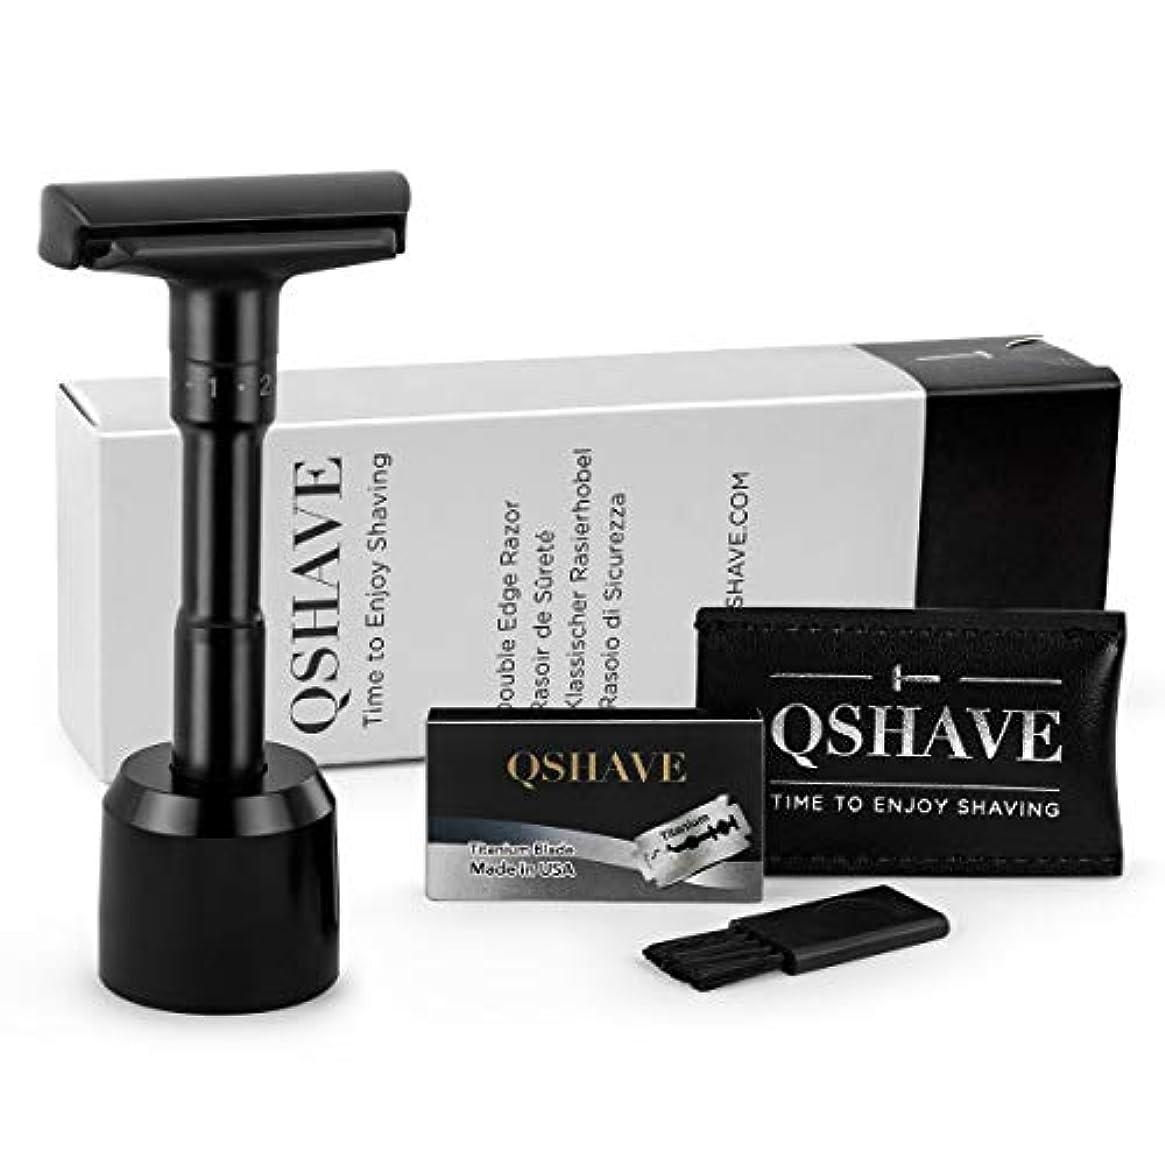 QSHAVE アジャスタブル両刃剃刀安全カミソリデラックスセット(スタンド付きカミソリ)